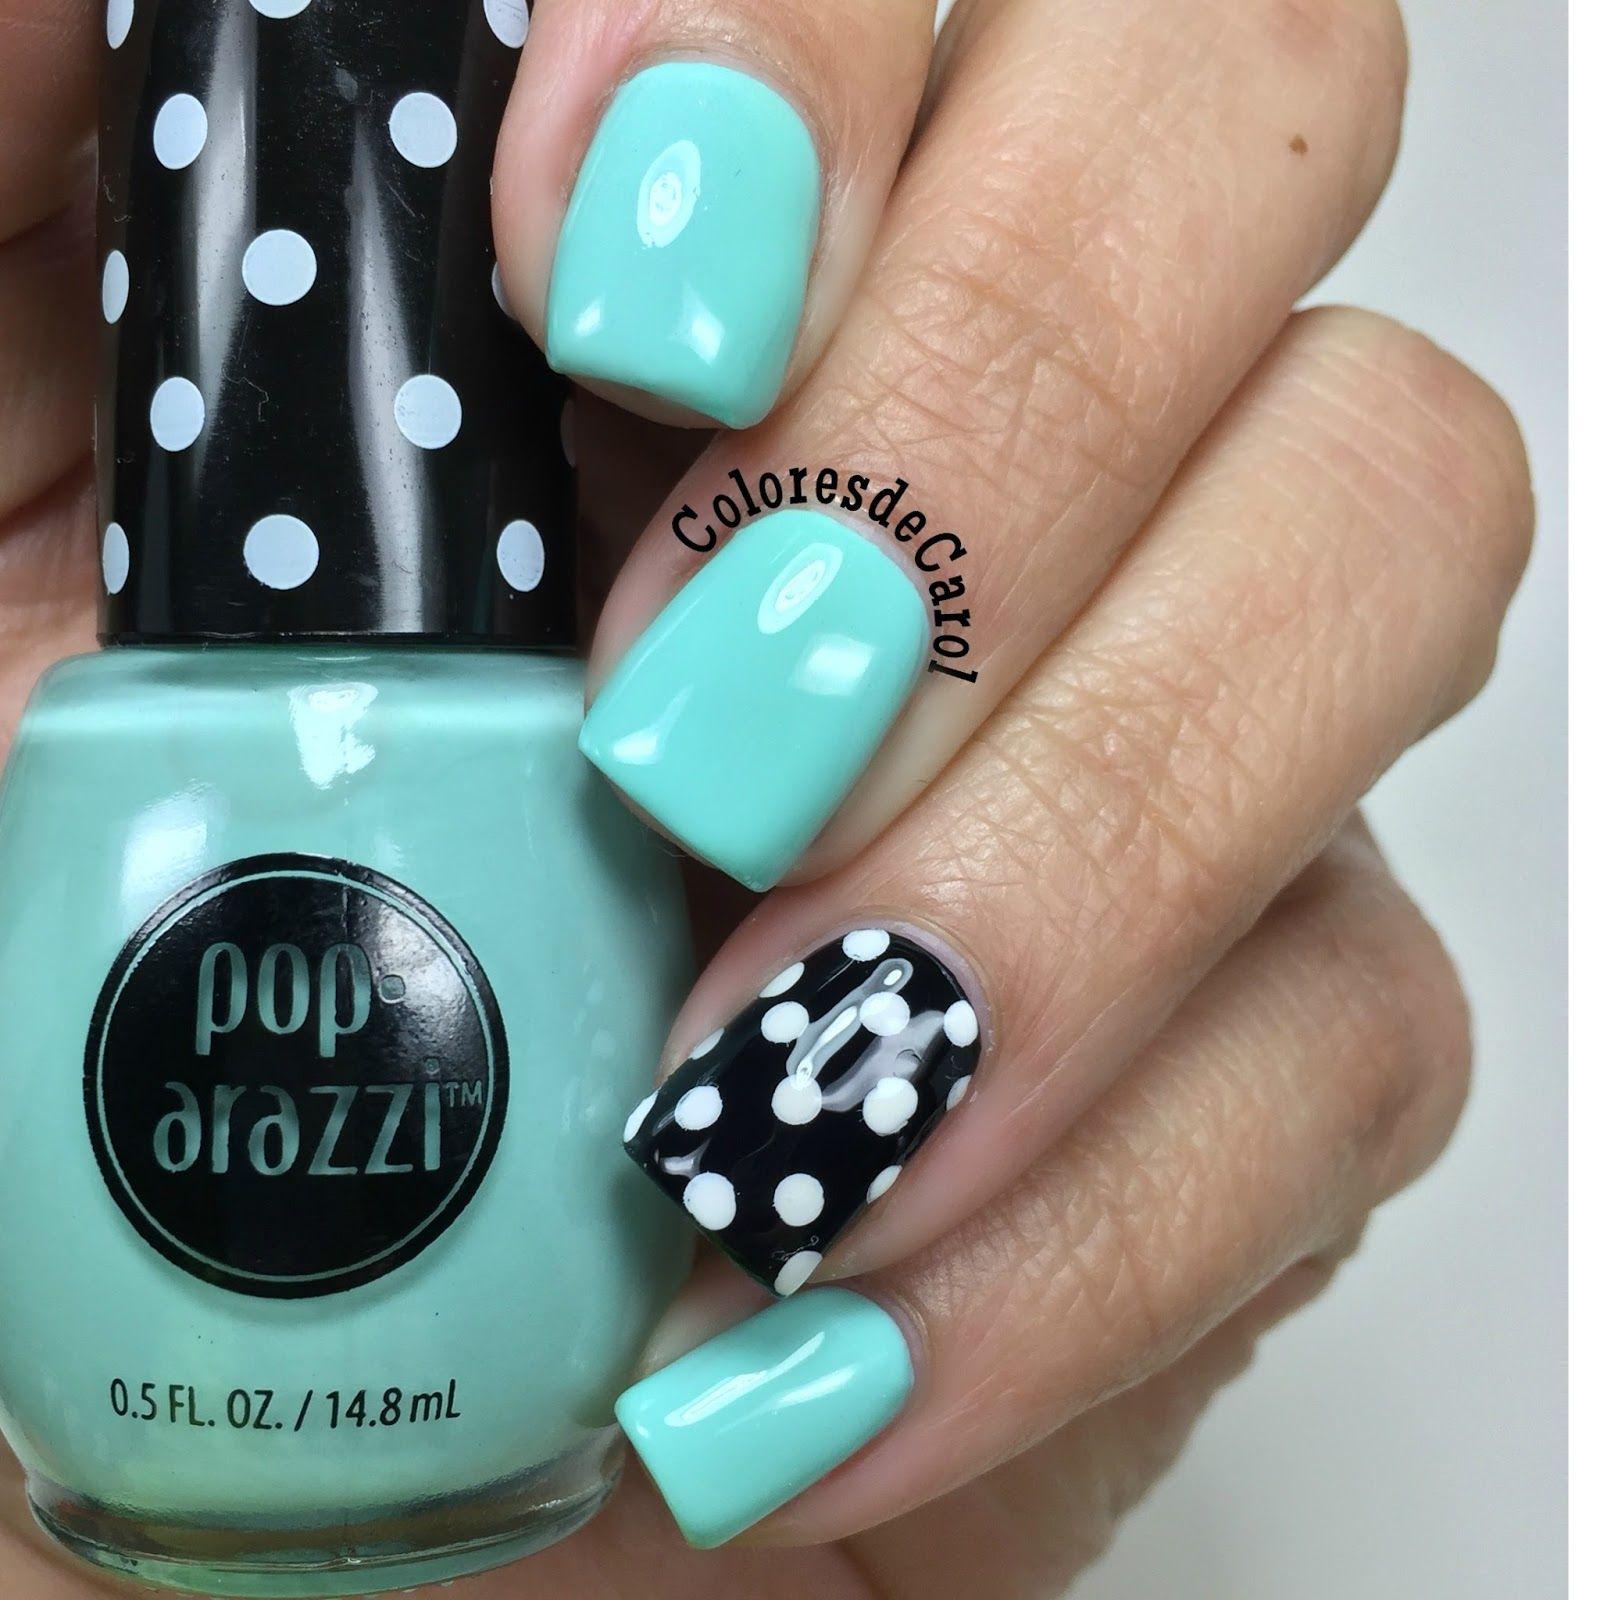 pop-arazzi nail polish shell me more - Google Search | Poparazzi ...